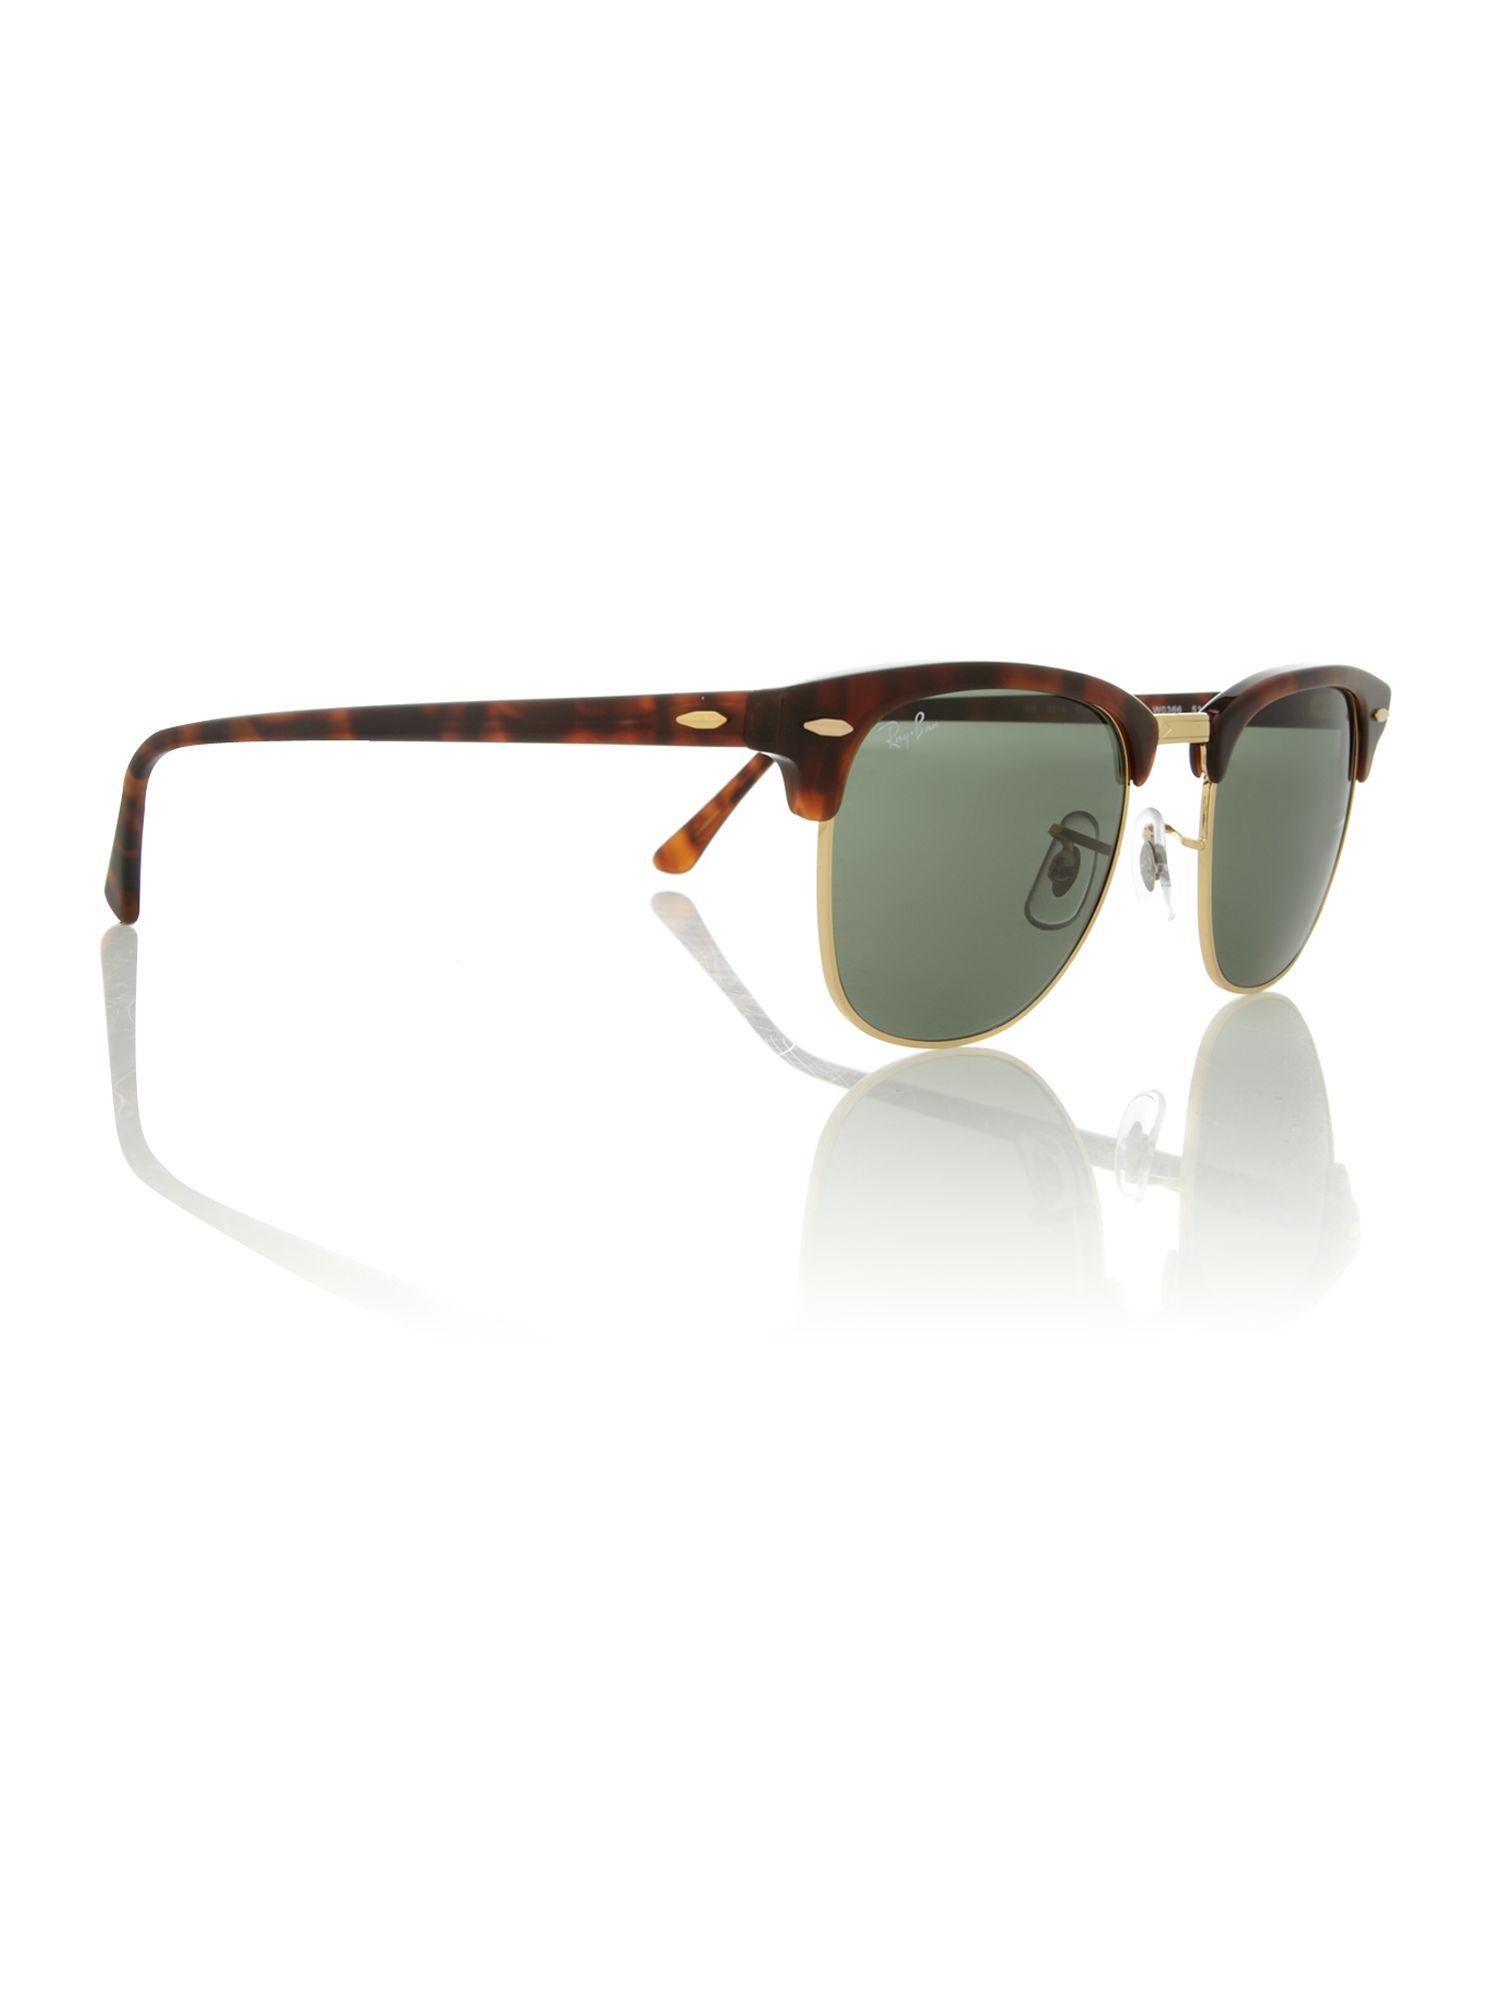 Ray ban unisex rb3016 wayfarer sunglasses in brown for men for Ray ban wayfarer verre miroir